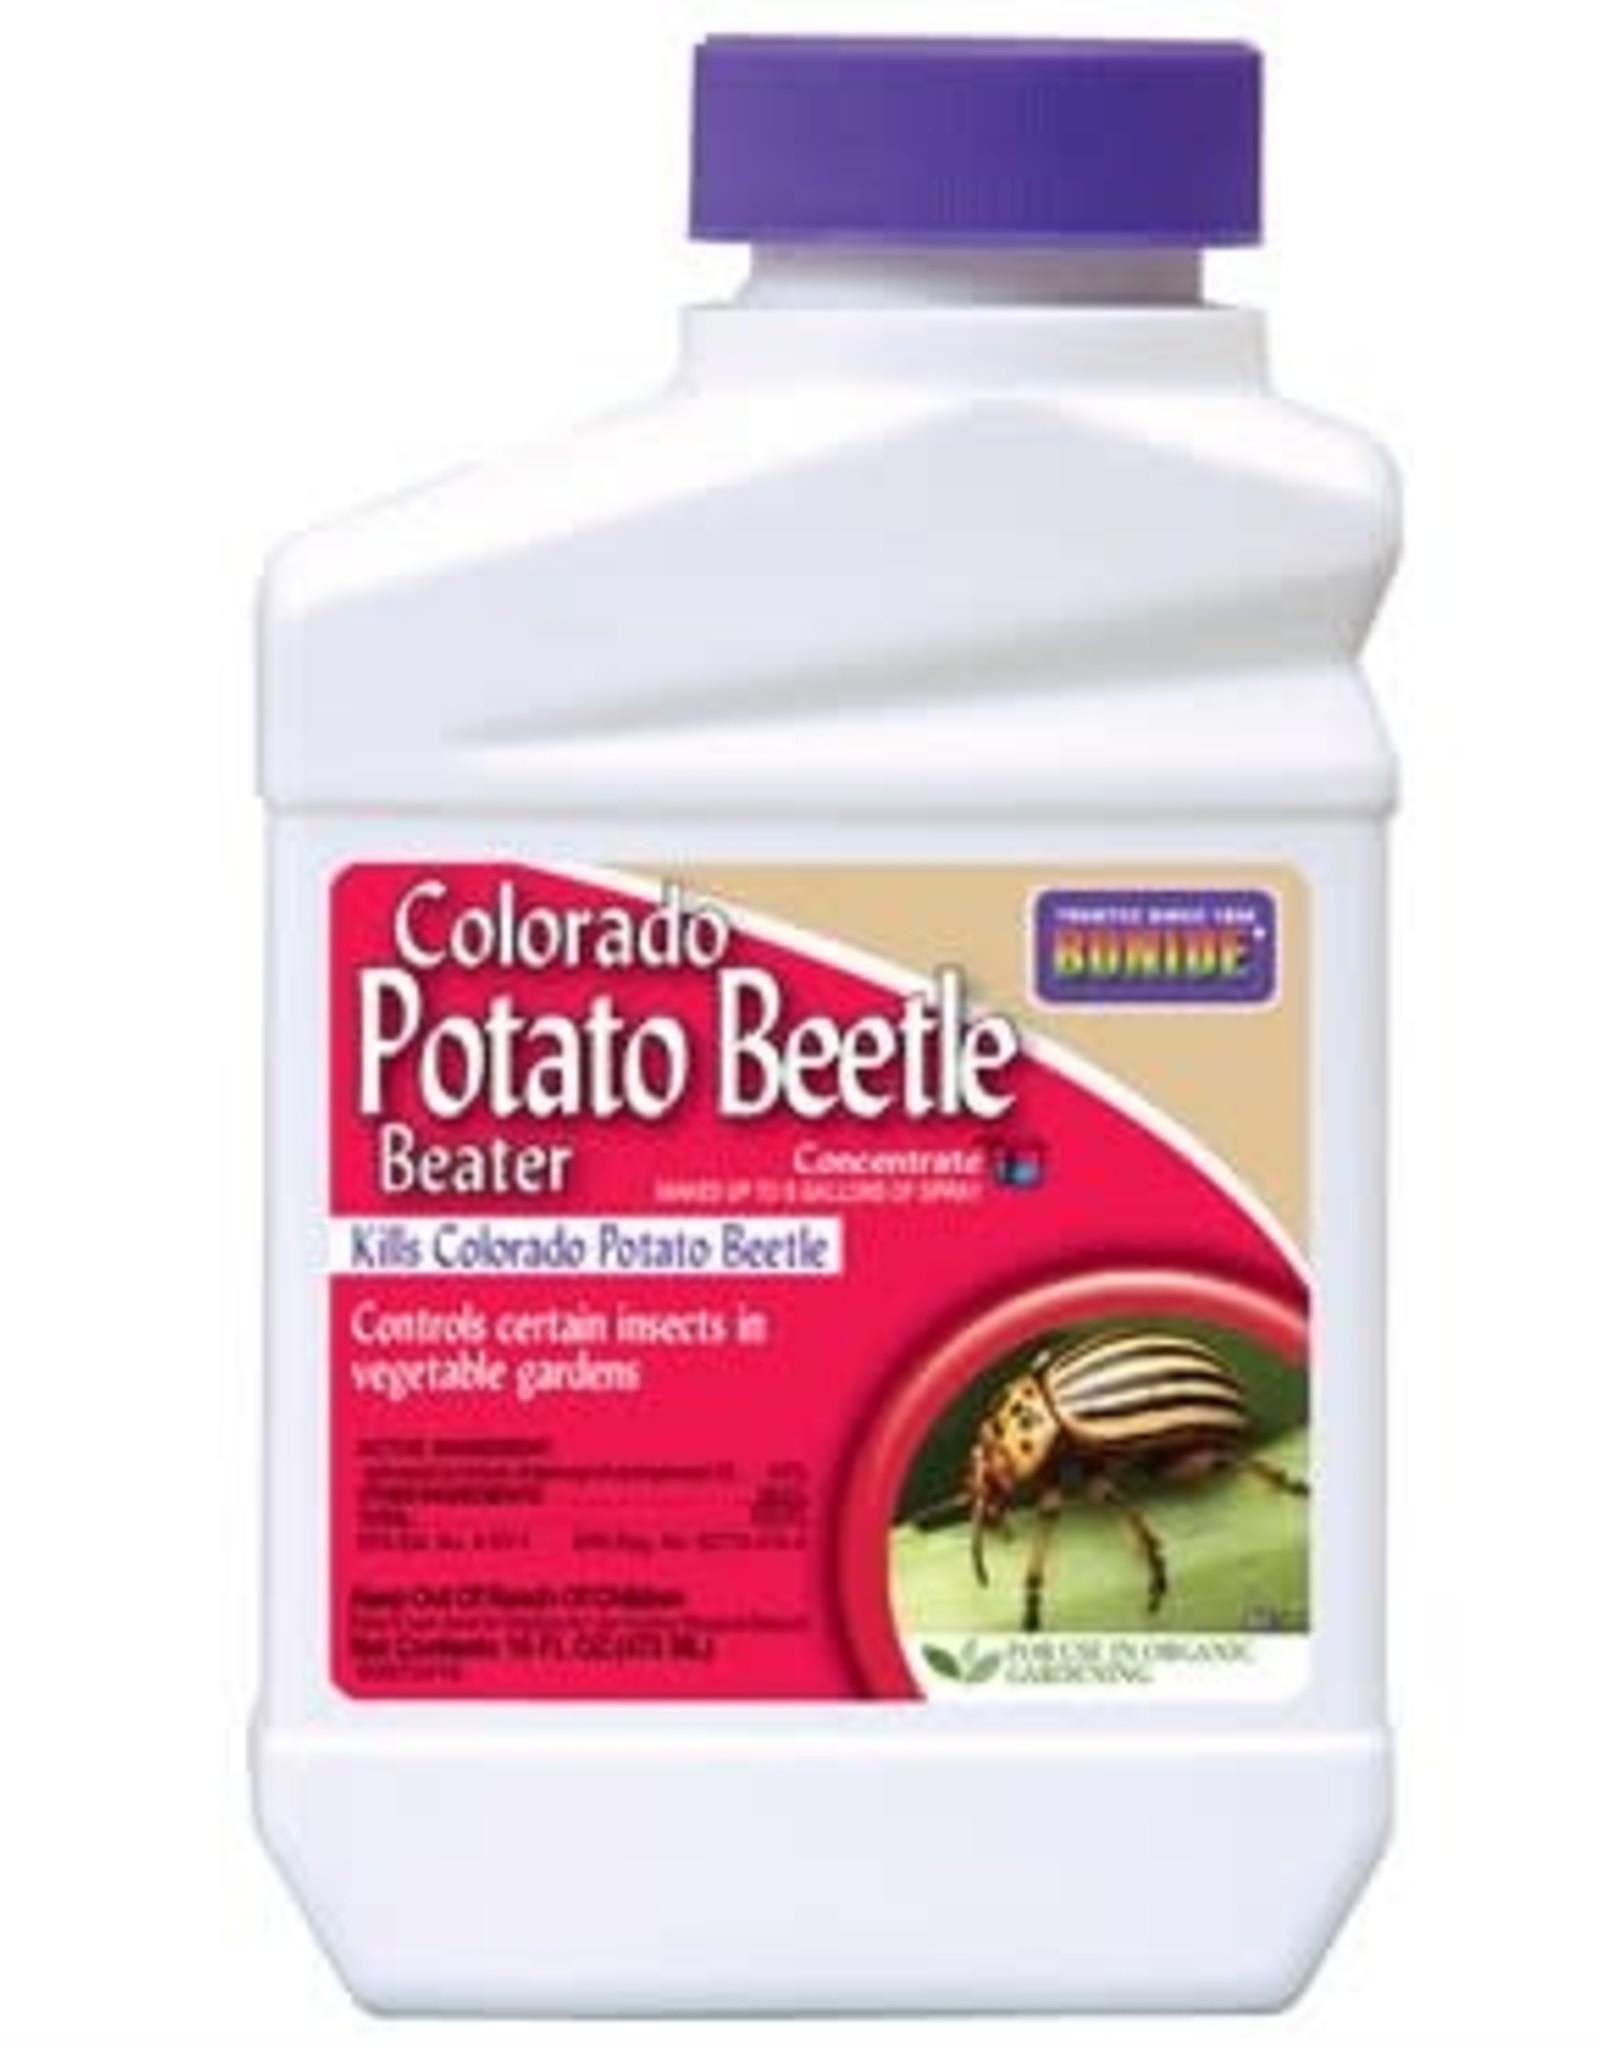 Bonide Colorado Potato Beetle Beater 16oz Concentrate